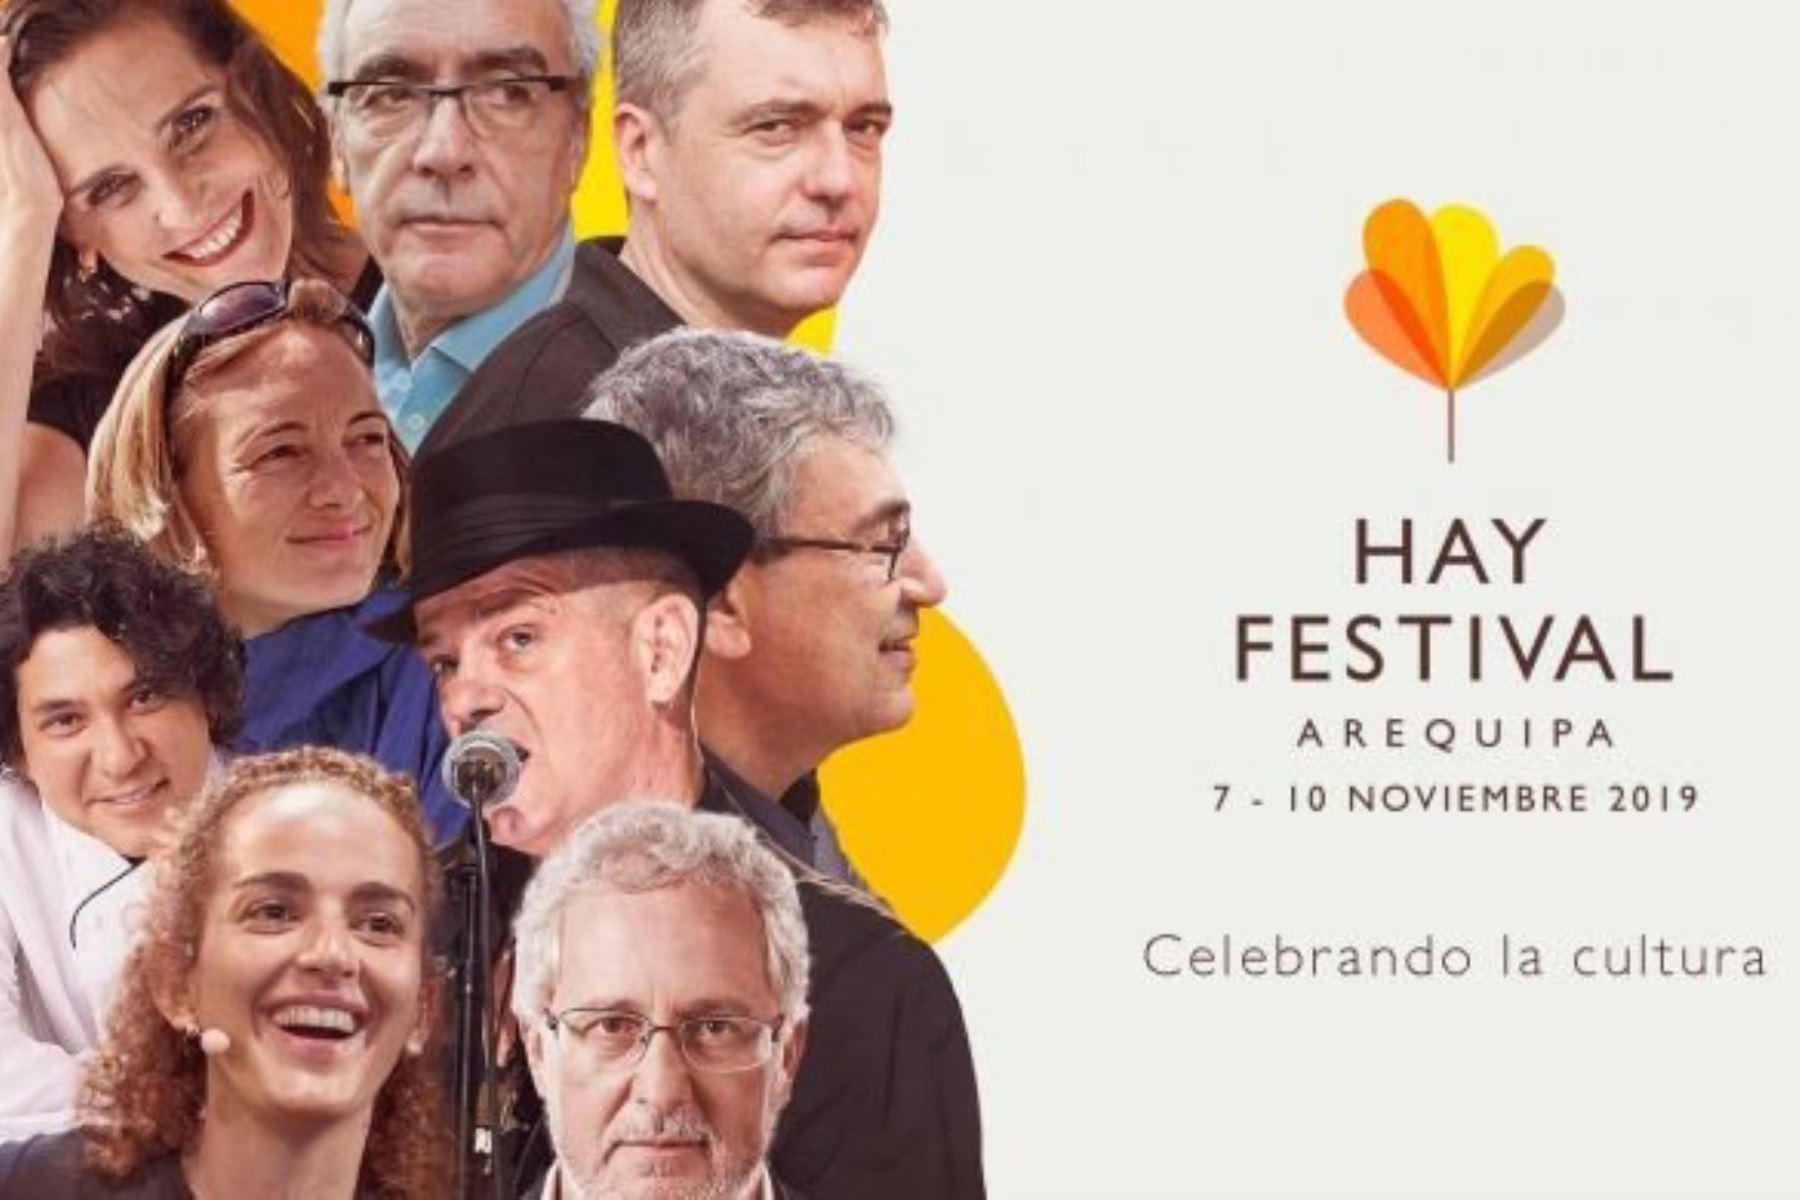 Hay Festival Arequipa 2019